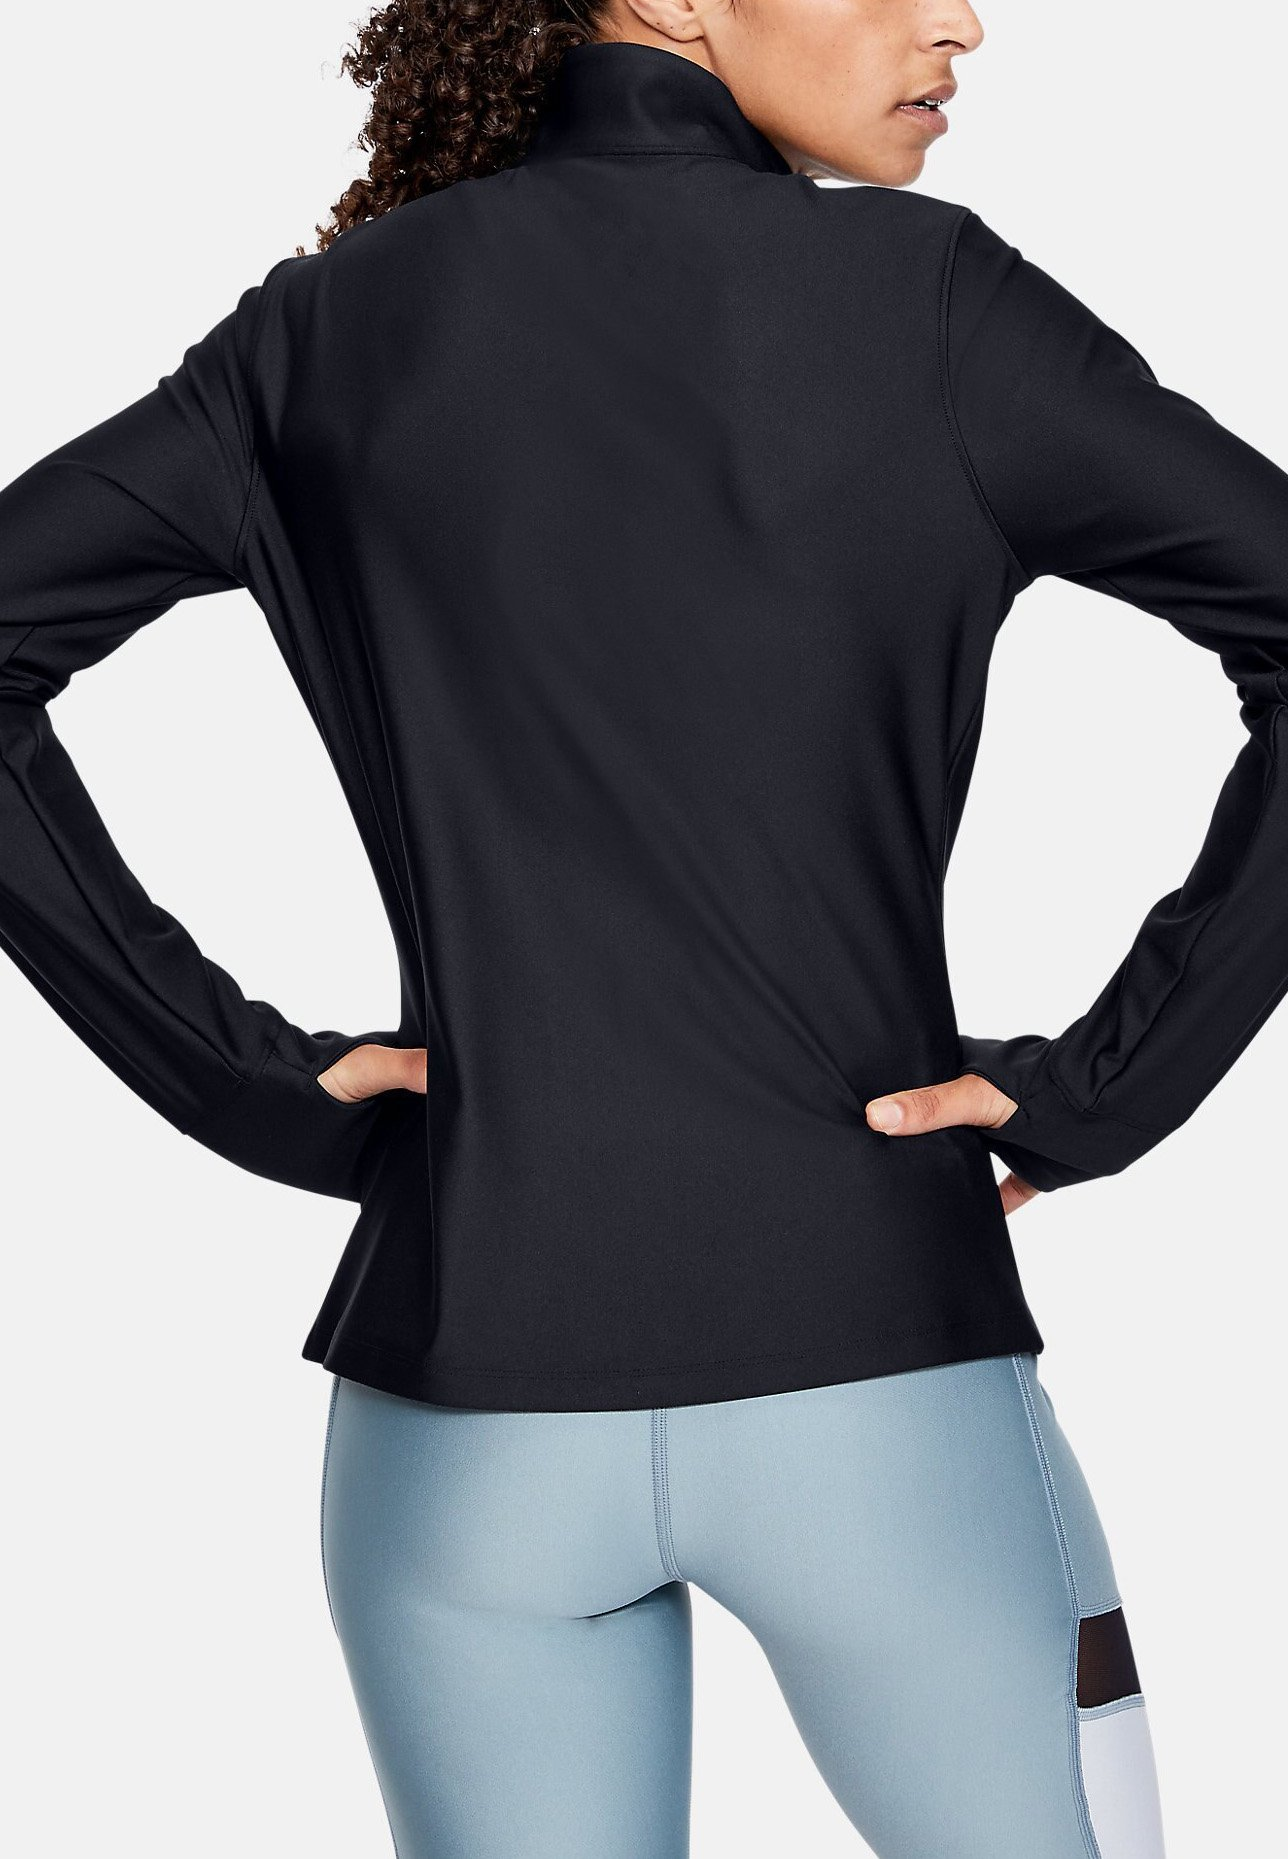 Under Armour Sports shirt - black cQiiz